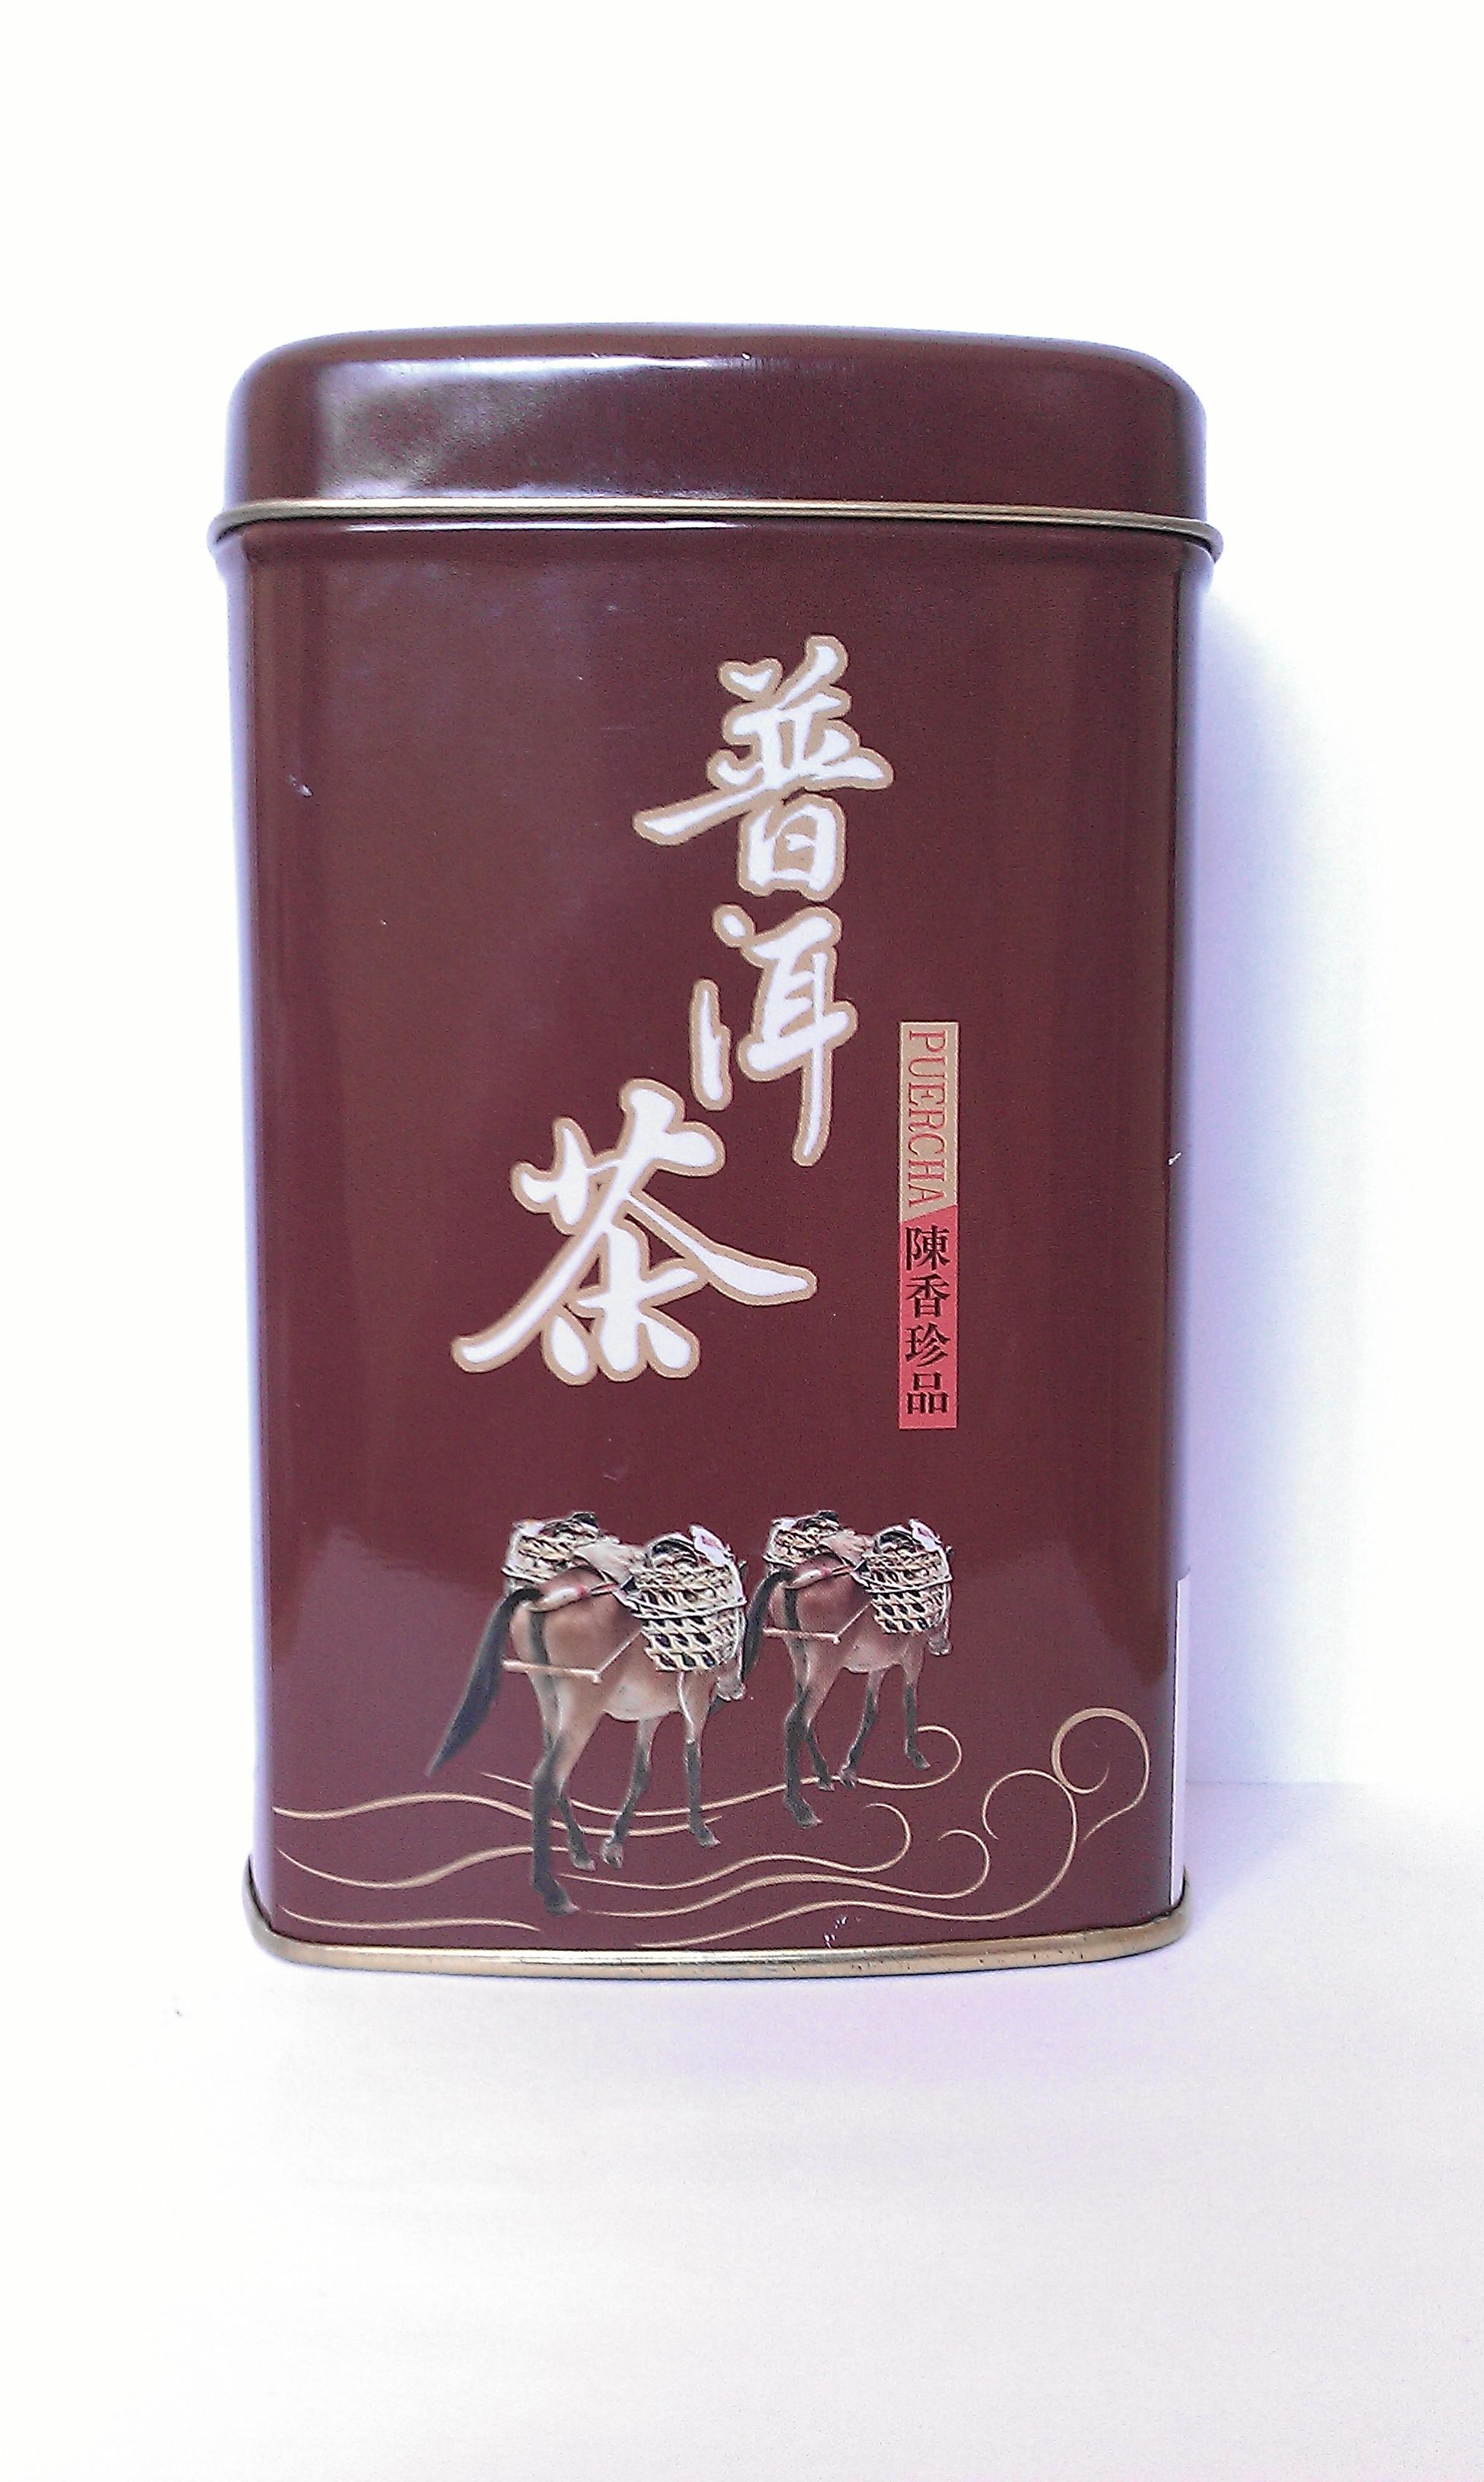 Puer Tea detox_ acupuncture.guru Nailsworth Glos